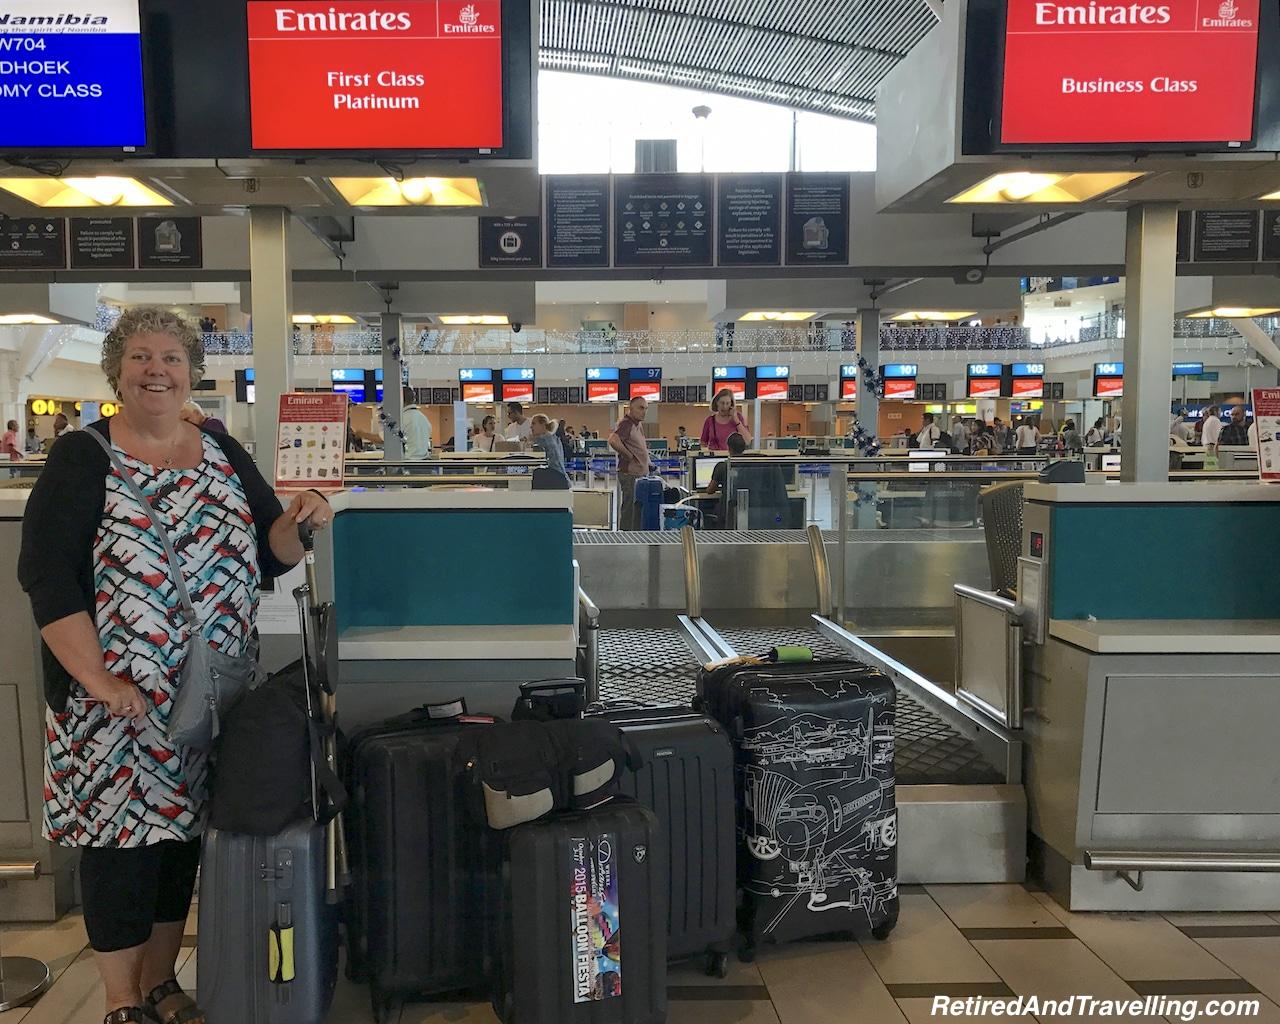 First Class Baggage - Emirates First Class.jpg